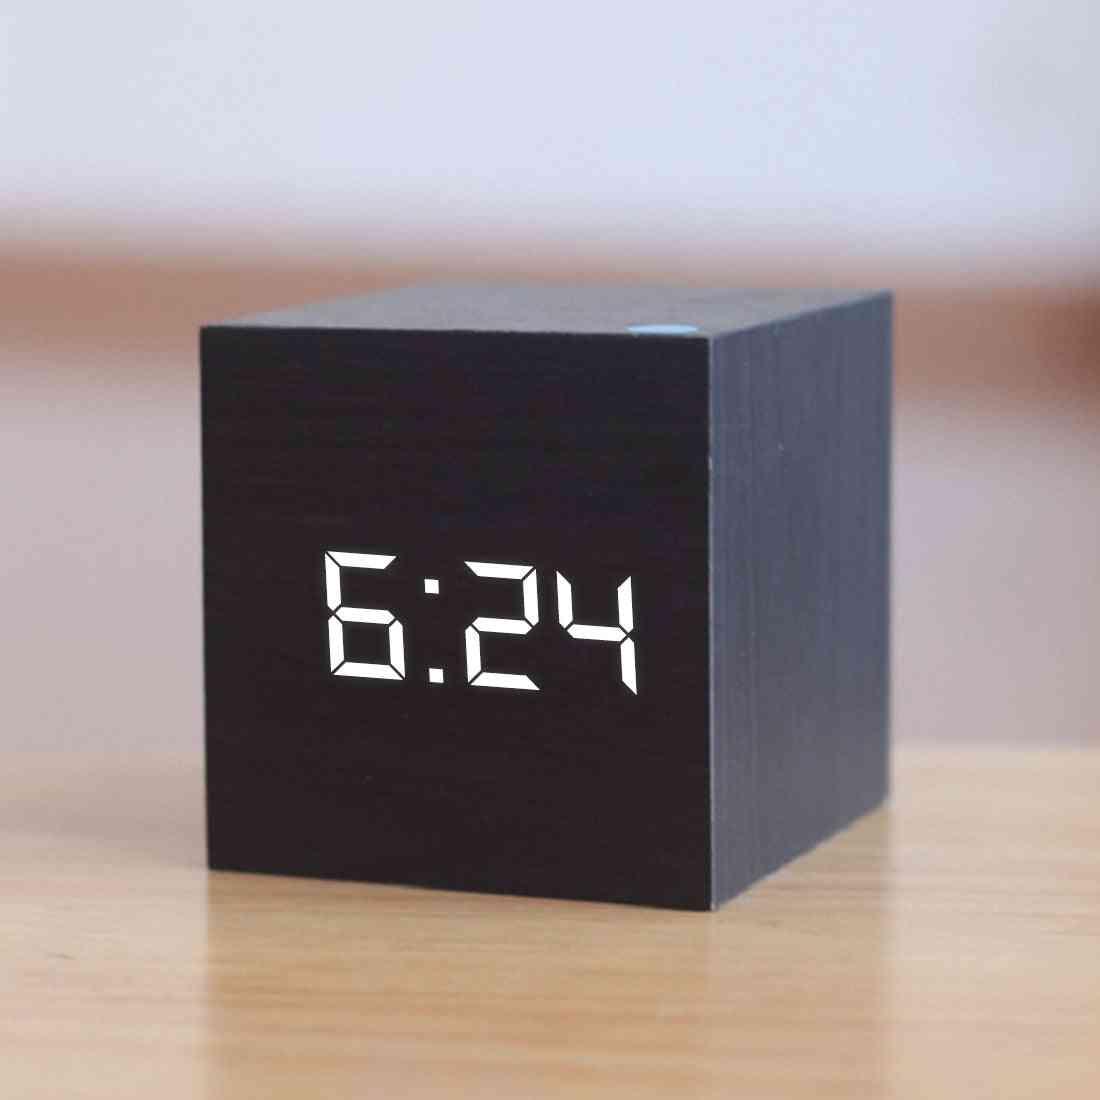 Digital Wooden, Led Alarm Glow Clock, Desktop Table, Voice Control Desk Tools